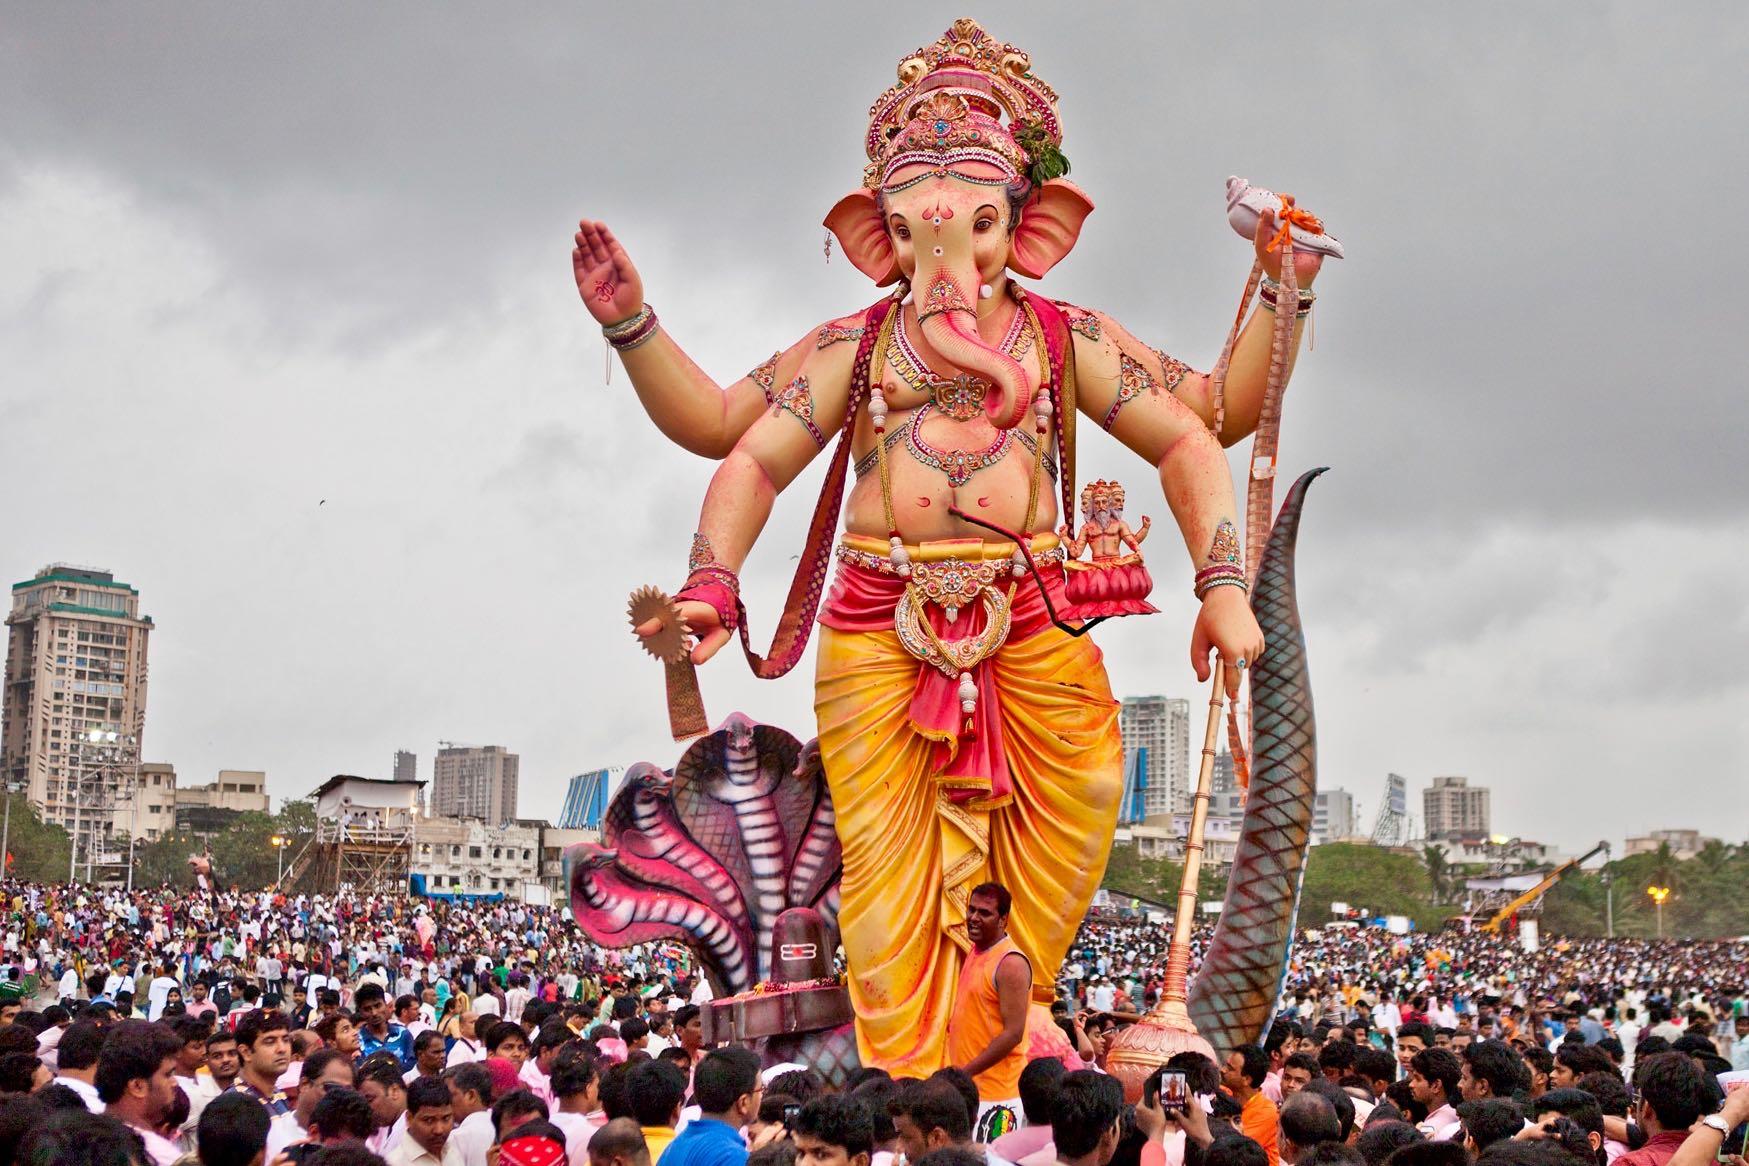 Devotees-gather-at-the-Girgaum-chowpatty-in-Mumbai-for-visarjan-of-their-favourite-deity-Lord-Ganesh.-Photo-Flickr_sandeepachetan